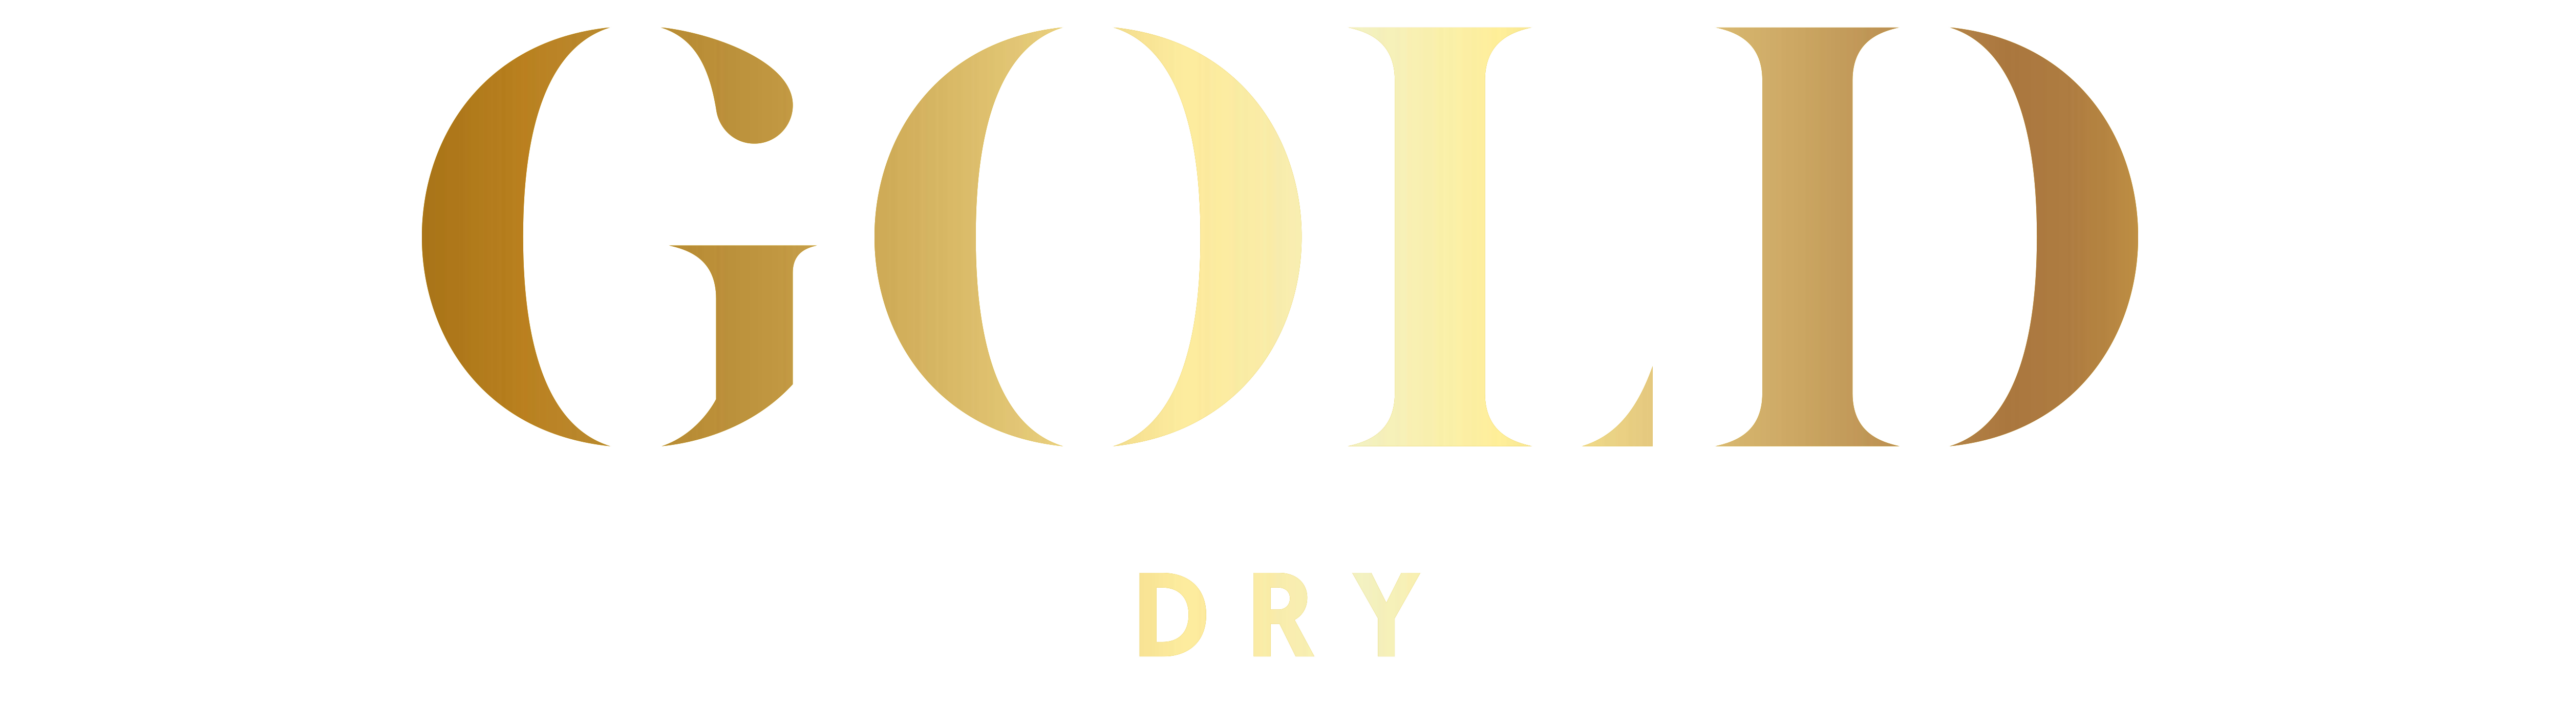 Gold Dry Vodka